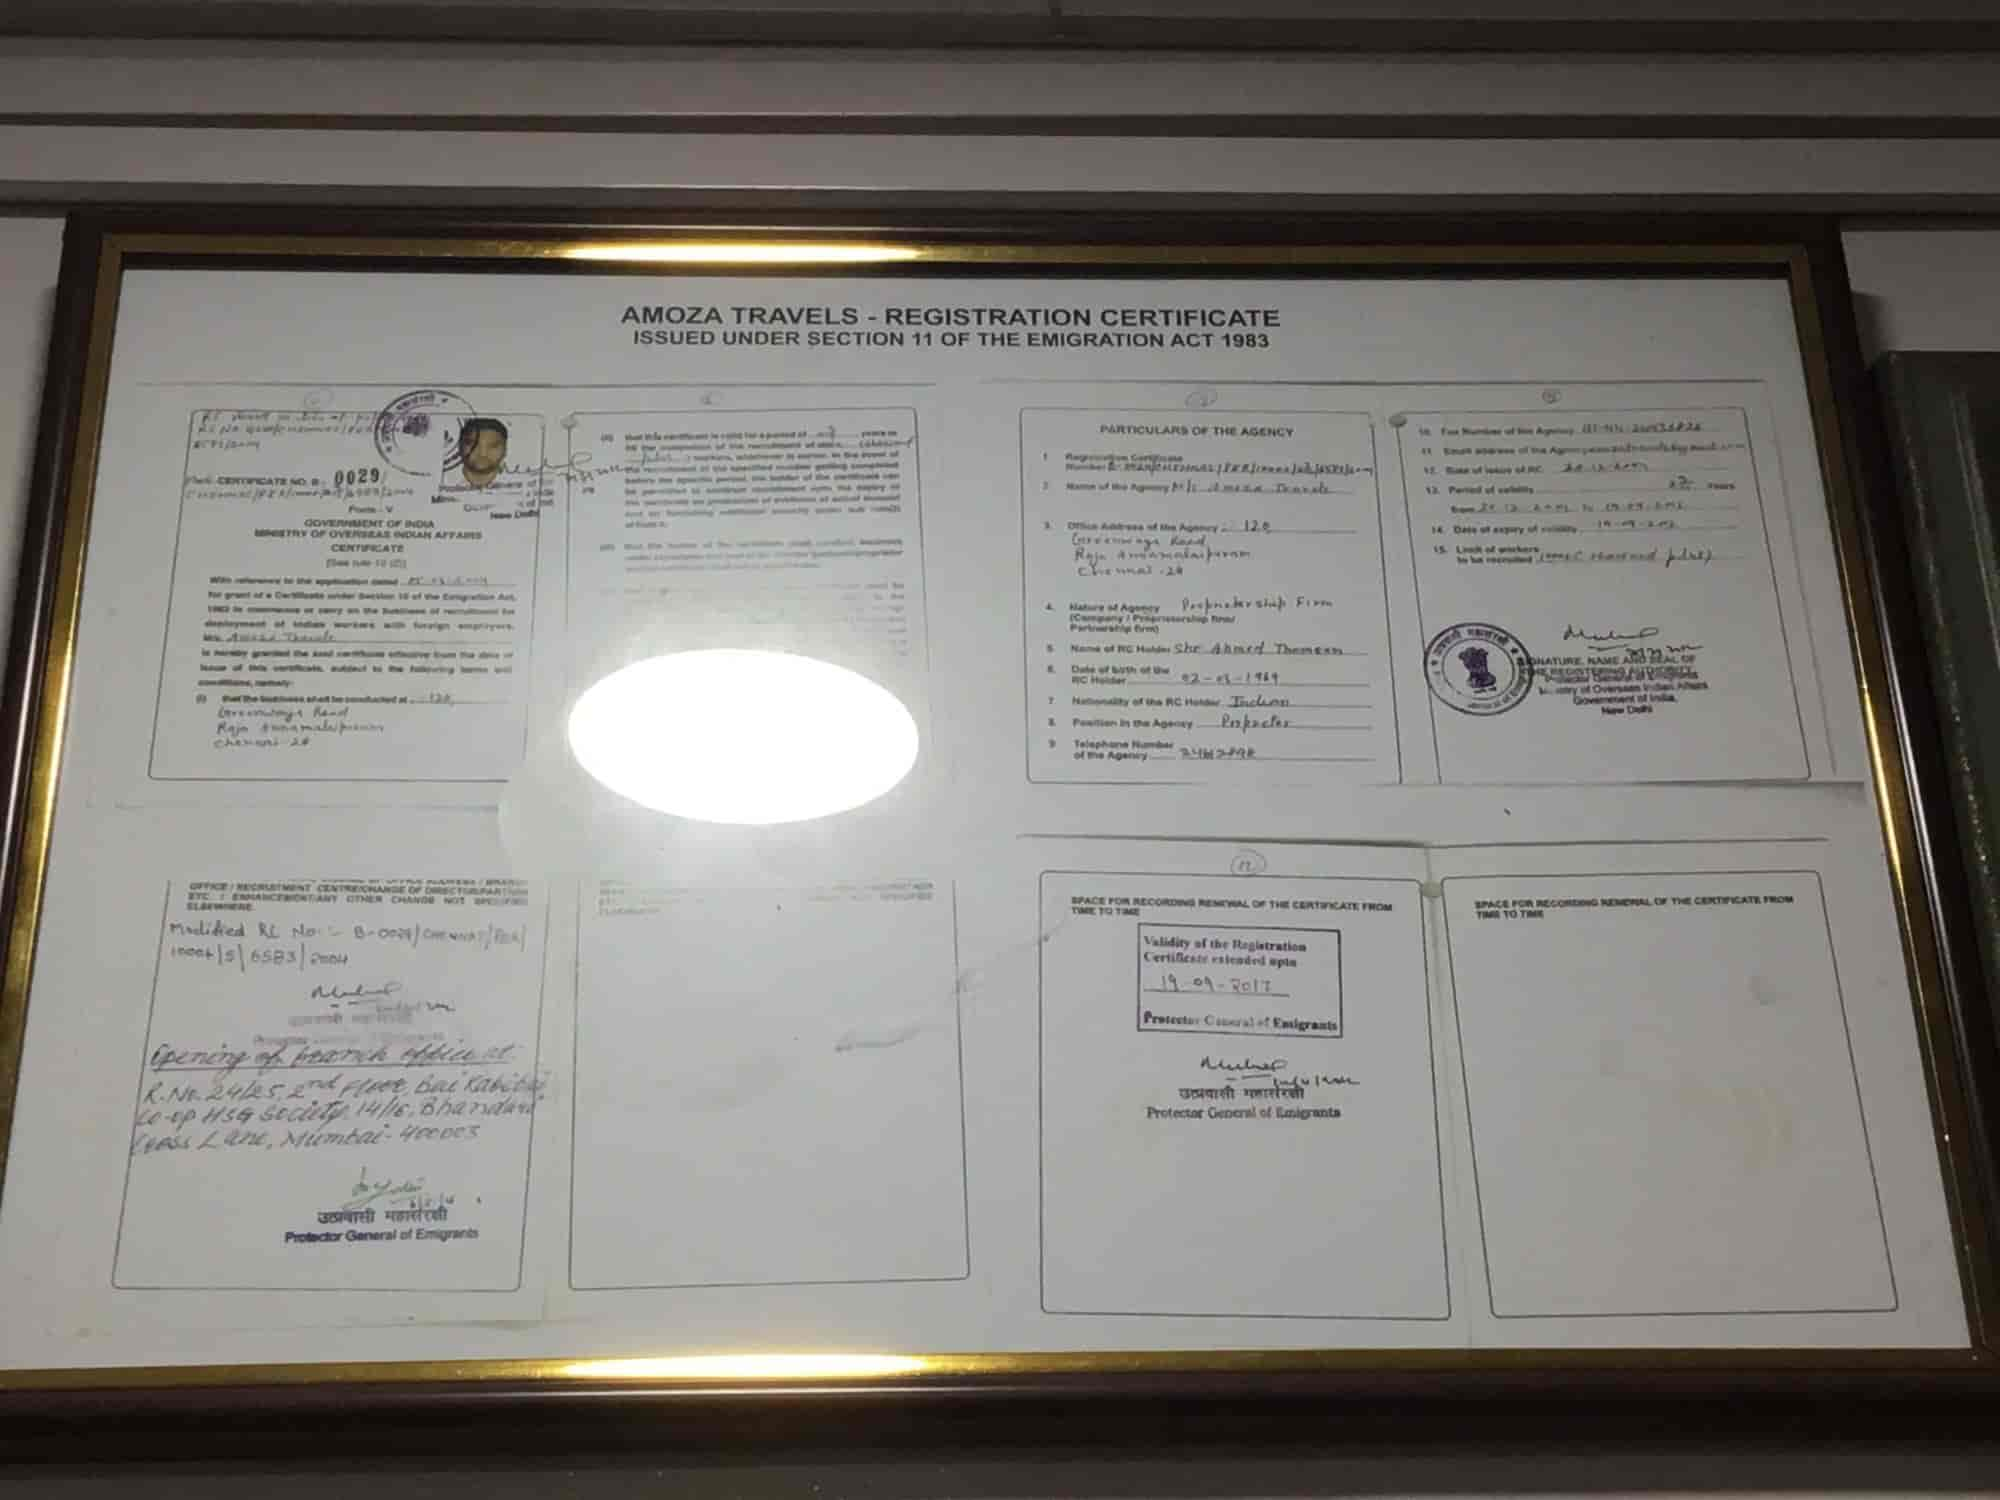 Amoza amoza security system pvt ltd (closed down) in raja